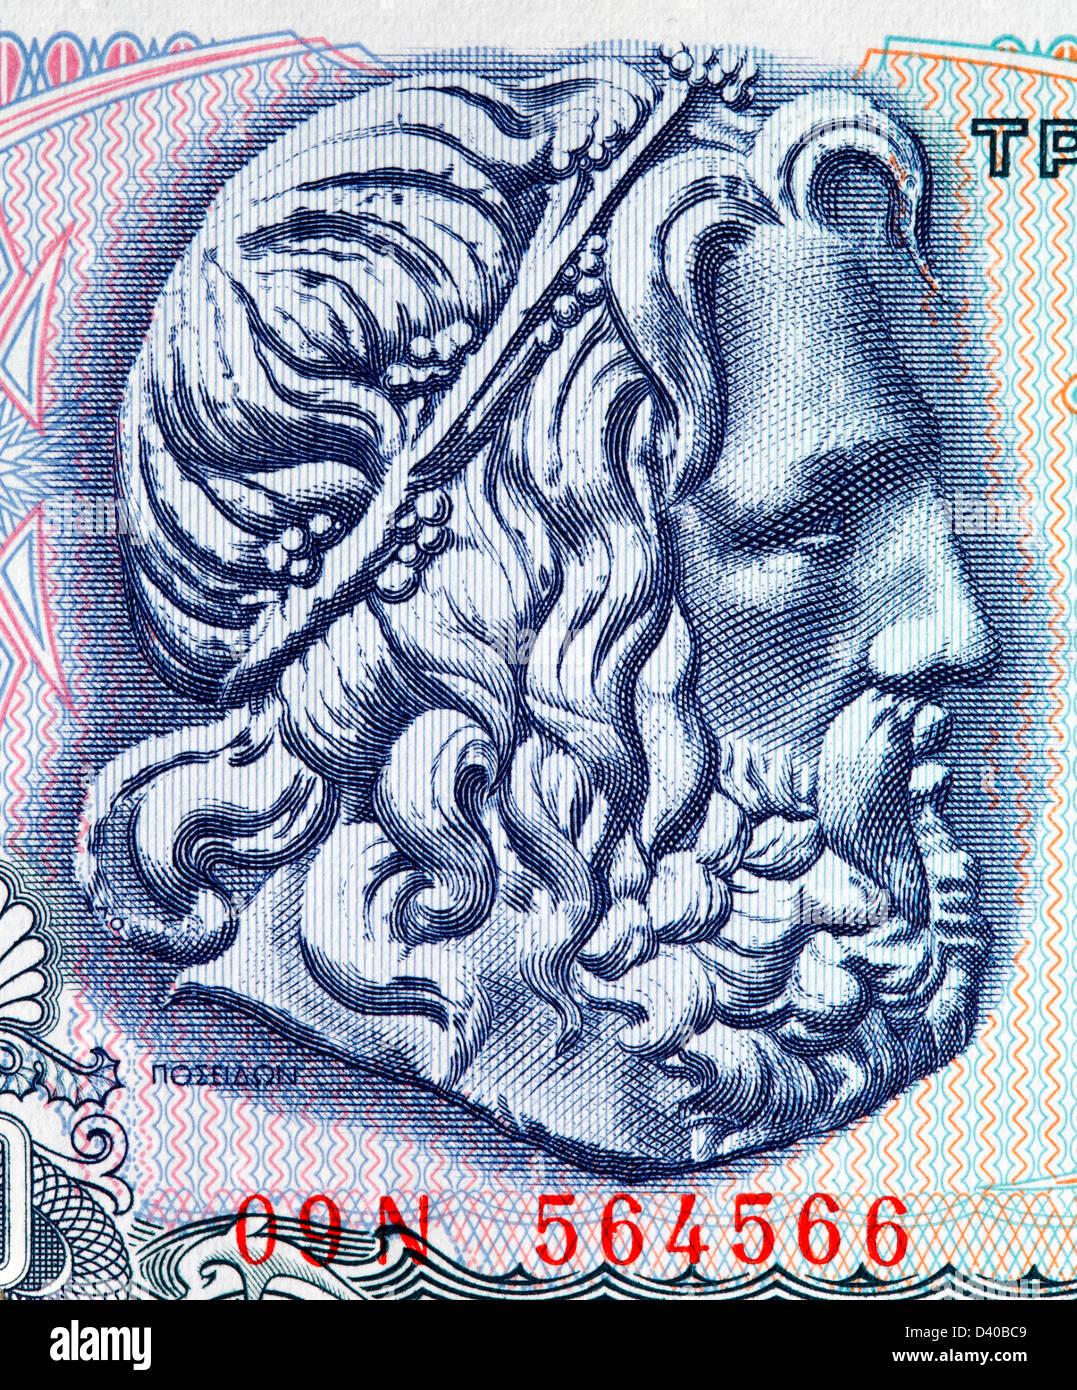 Head of Poseidon from 50 Drachmas banknote, Greece, 1978 - Stock Image